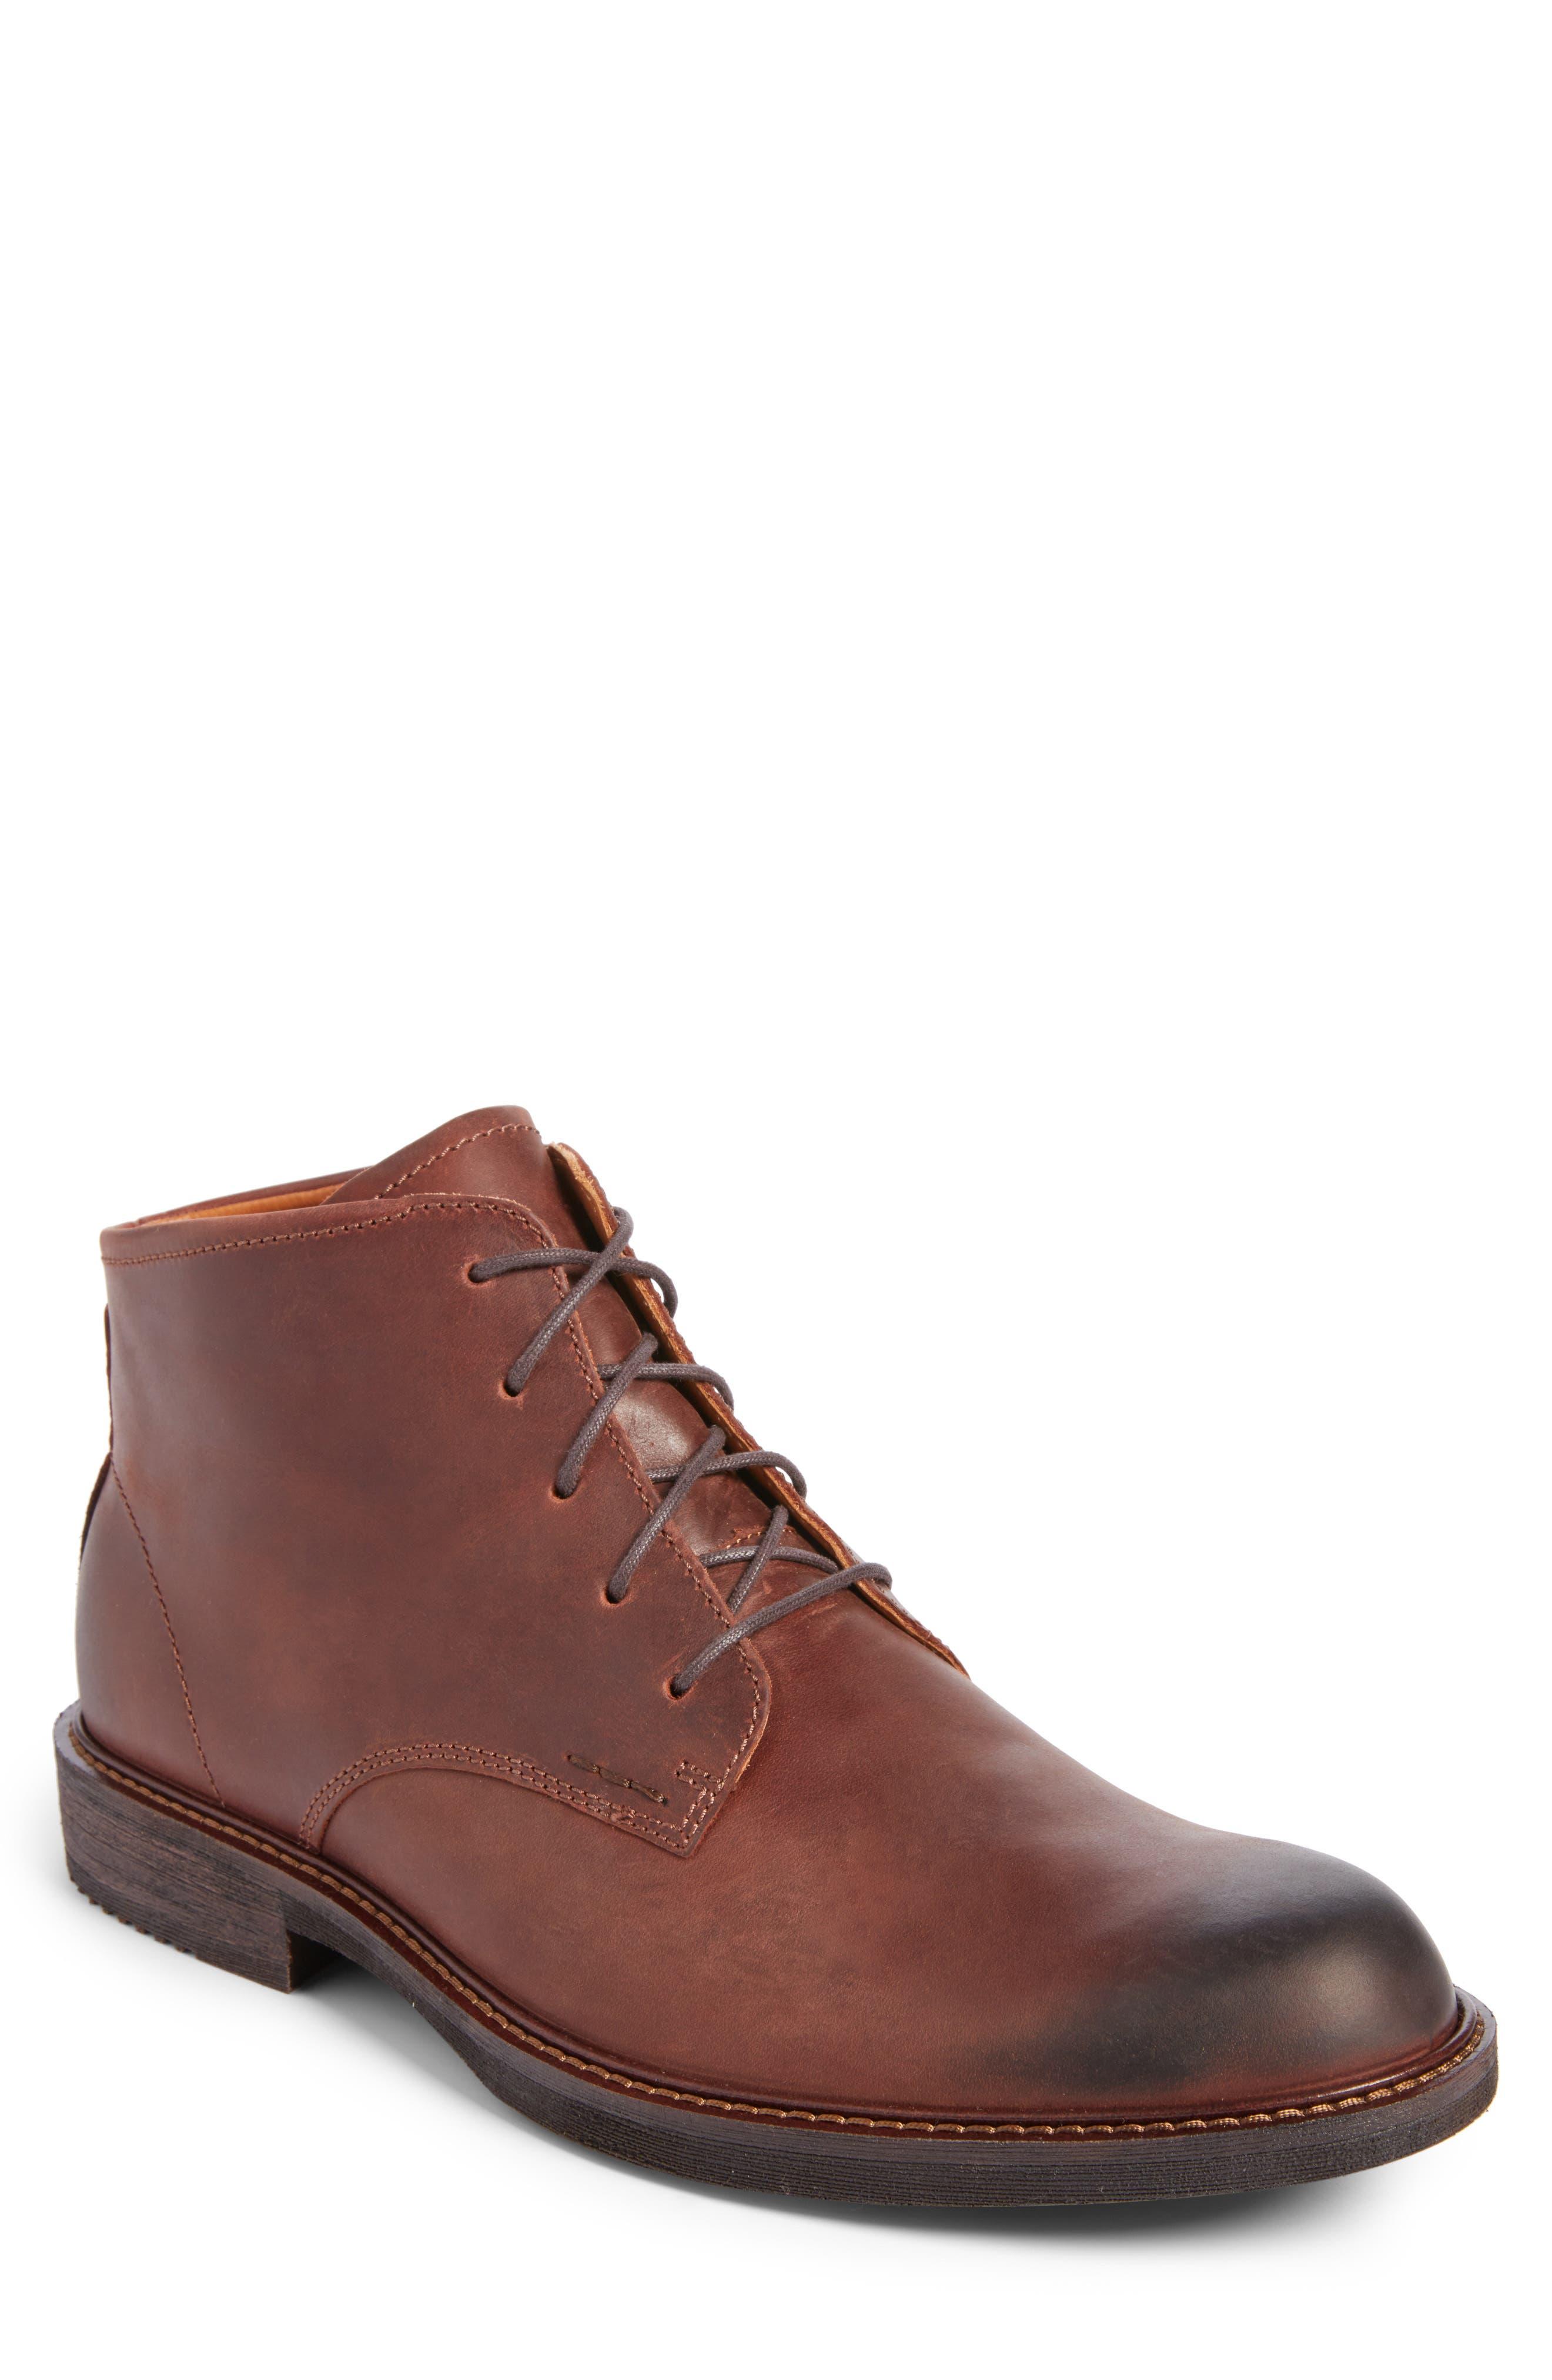 Alternate Image 1 Selected - ECCO 'Kenton' Plain Toe Boot (Men)